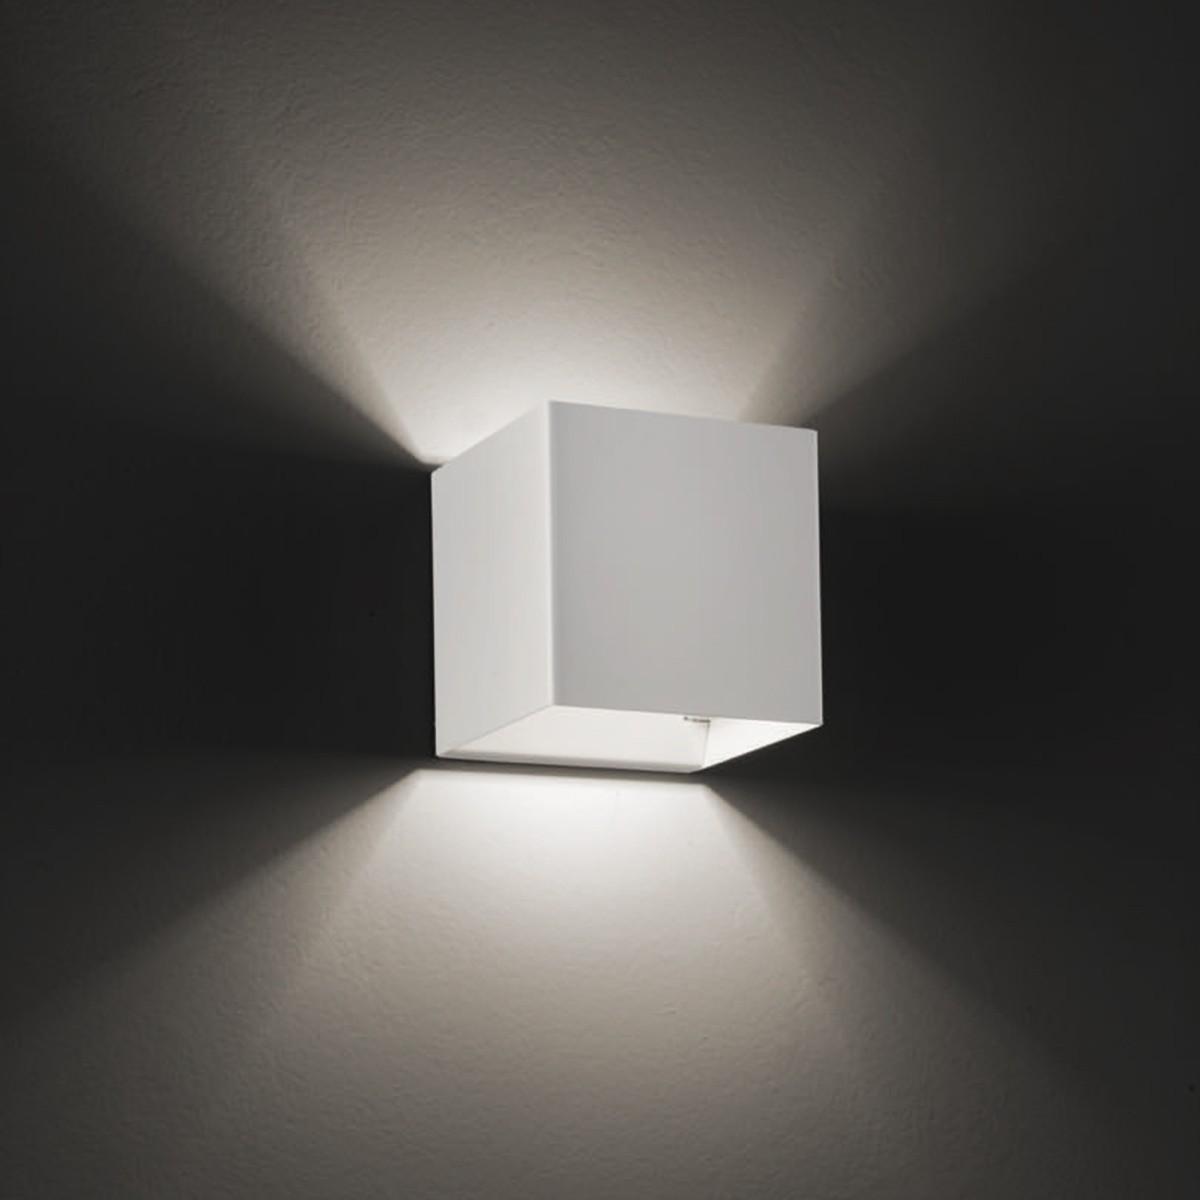 Studio Italia Design Laser Cube 10 x 10 LED Wandleuchte, 2700° K, weiß matt